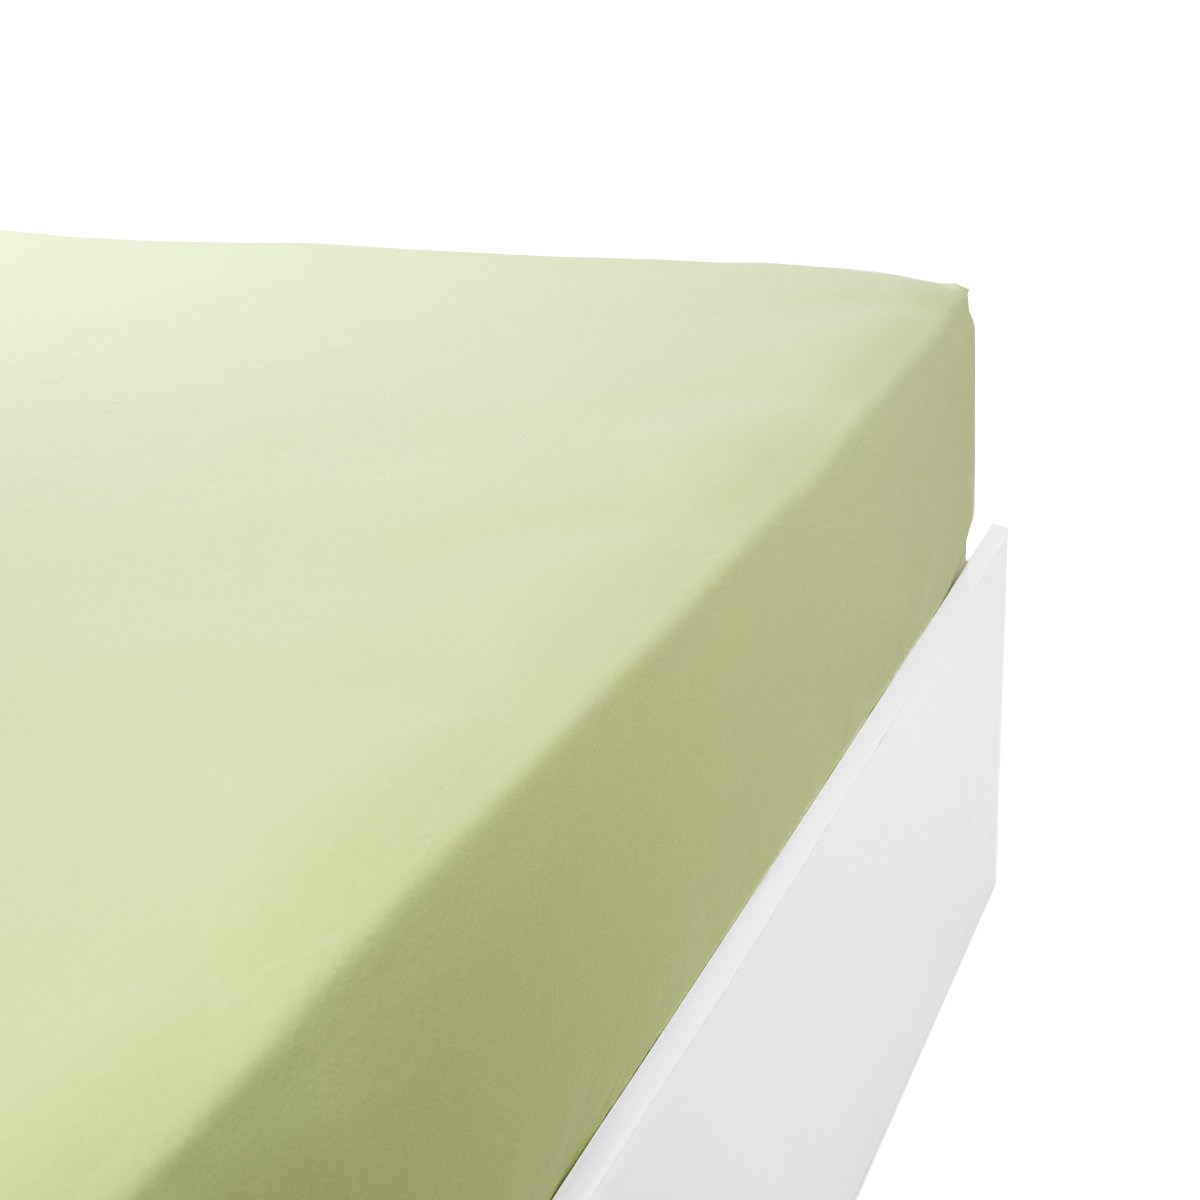 Drap housse flanelle en Molleton Vert anis 90x200 cm